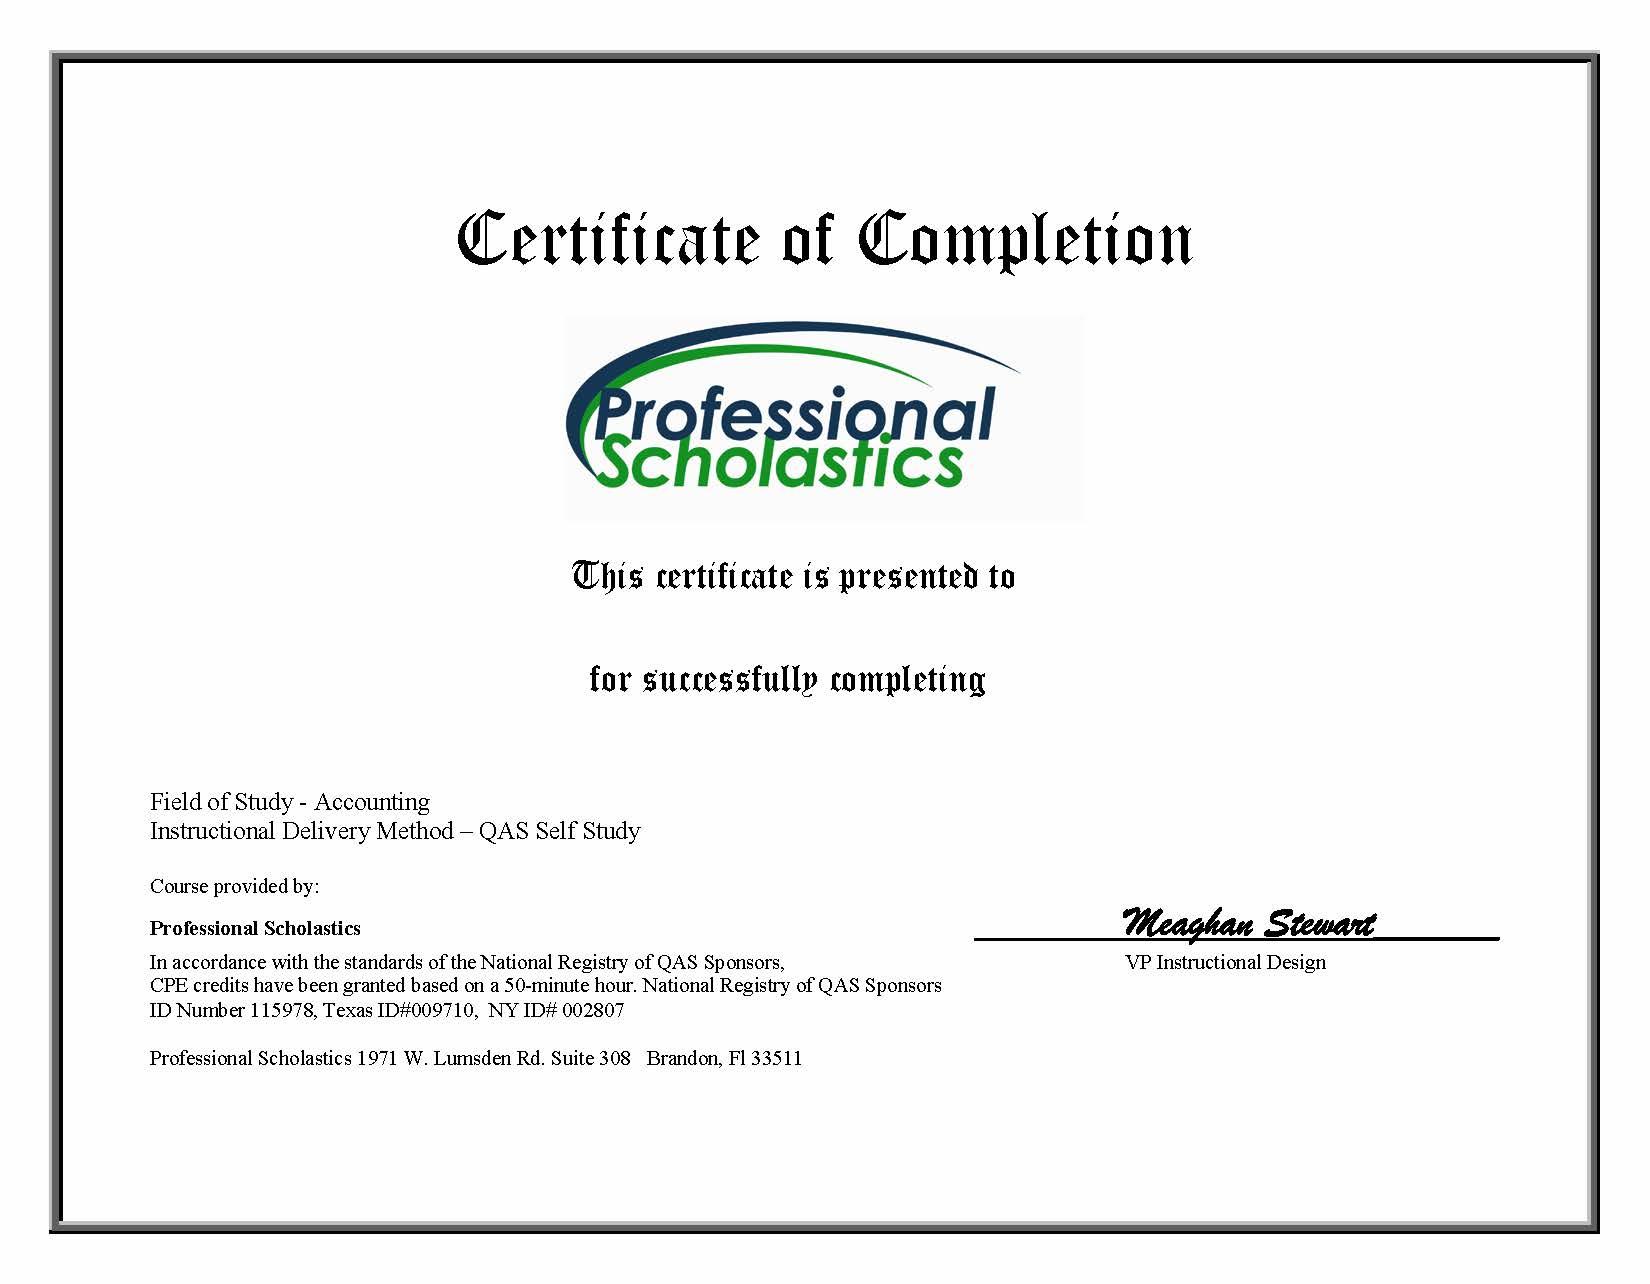 Certificates. Revenue & Margin Analysis 2 Credit Hour Course